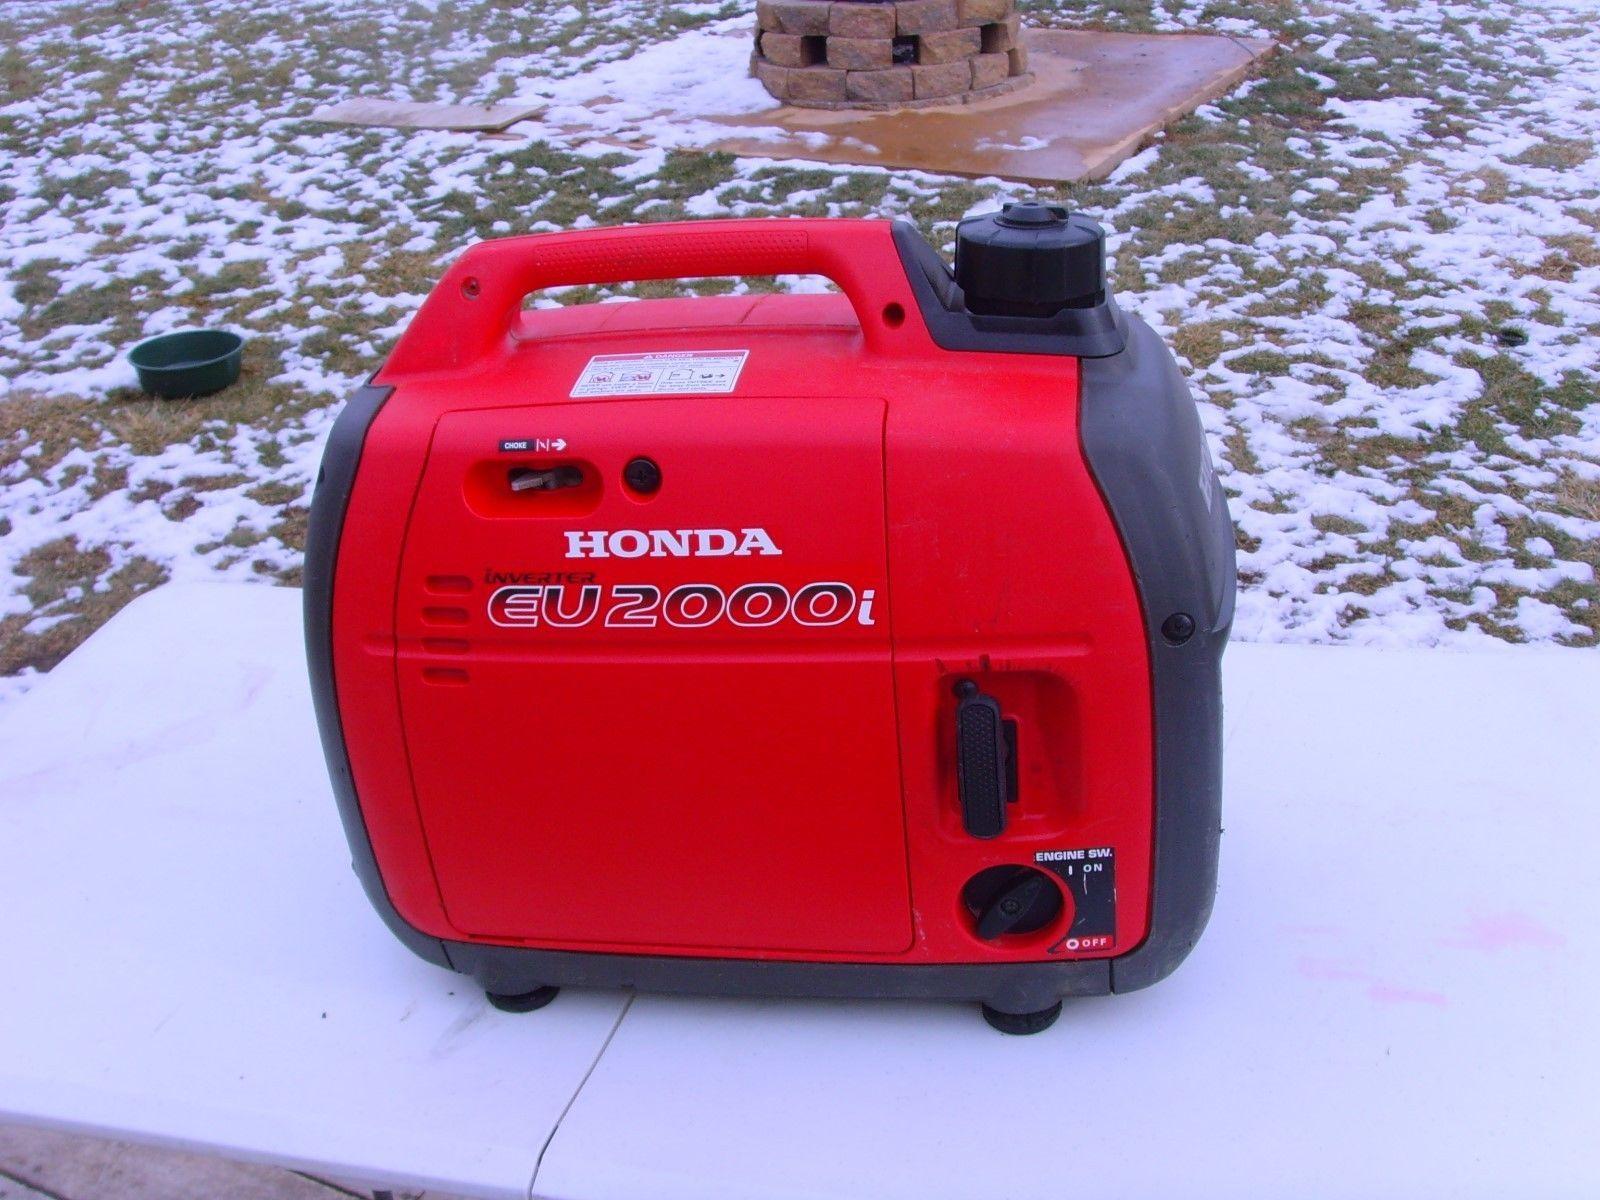 Honda EU2000i 1600 Watt Portable Inverter Generator